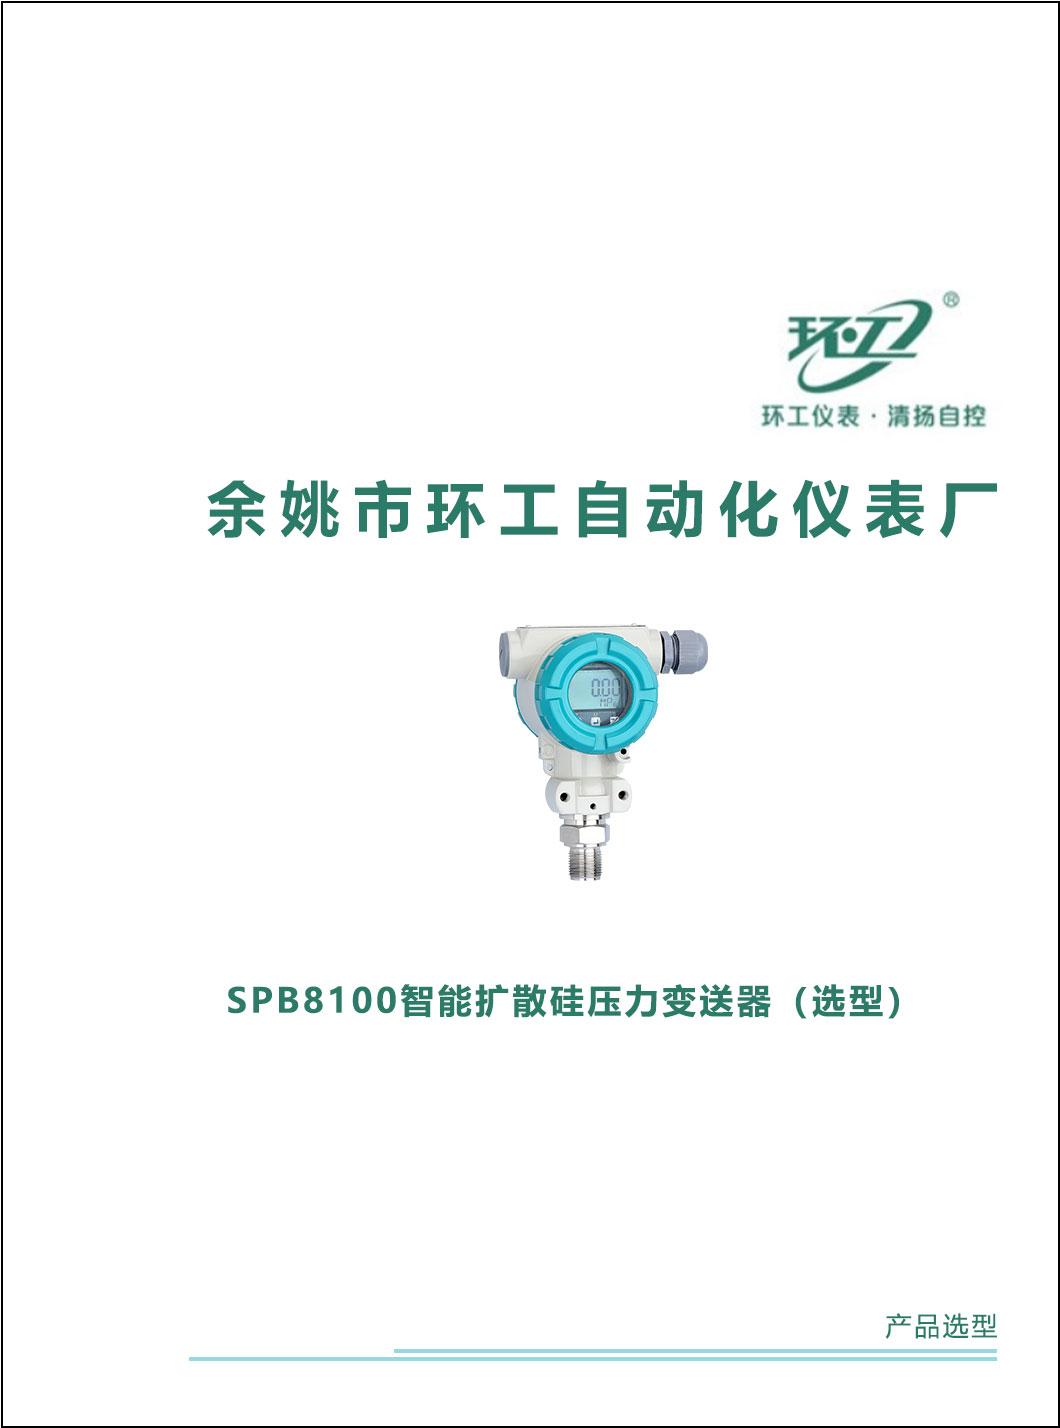 SPB8100智能扩散硅压力变送器-环工仪表-清扬自控